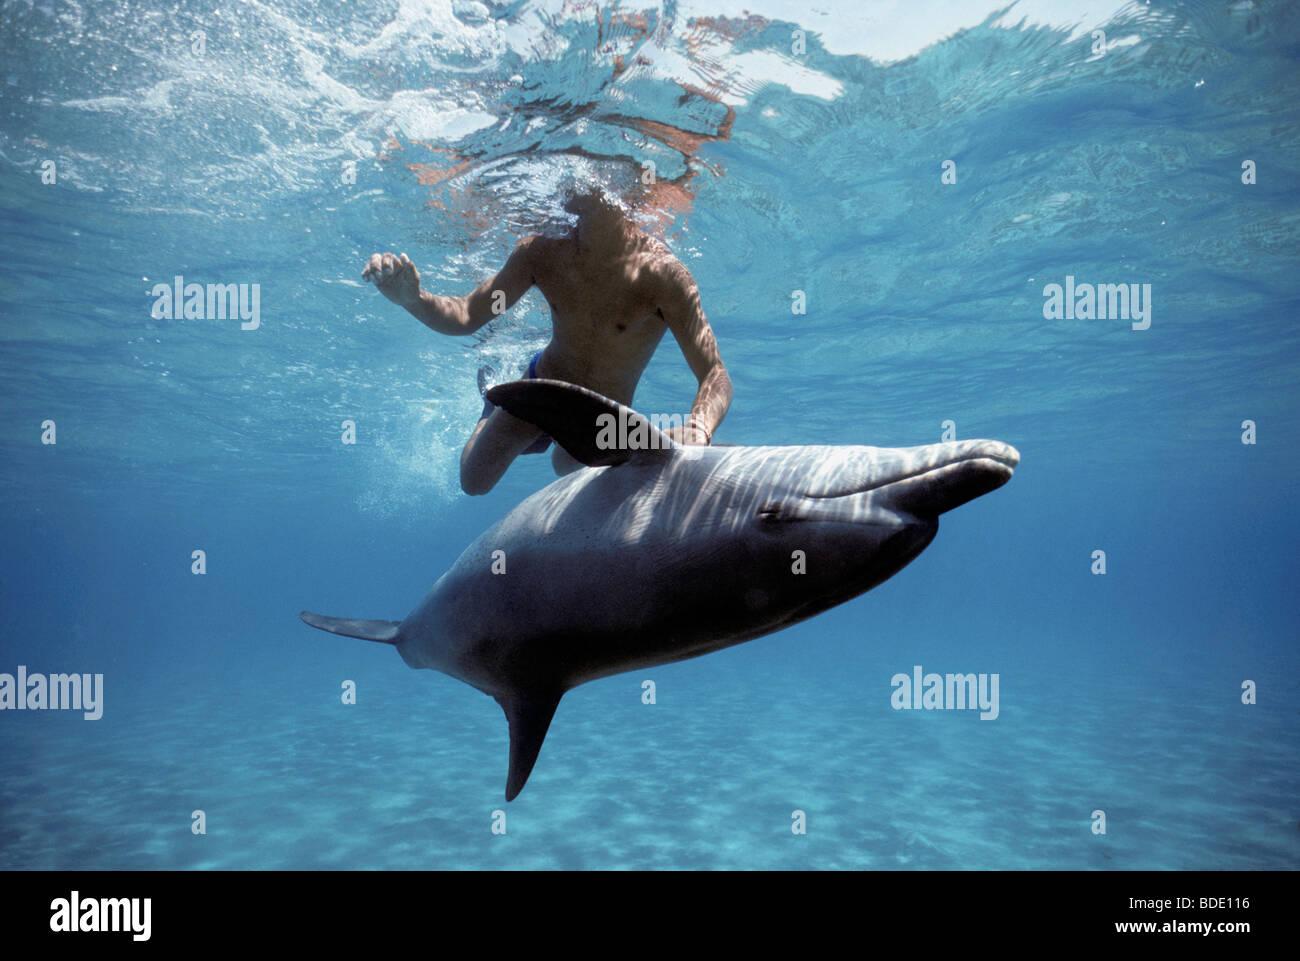 Snorkeler interacting with wild Bottlenose Dolphin (Tursiops truncatus) Nuweiba, Egypt - Red Sea. - Stock Image